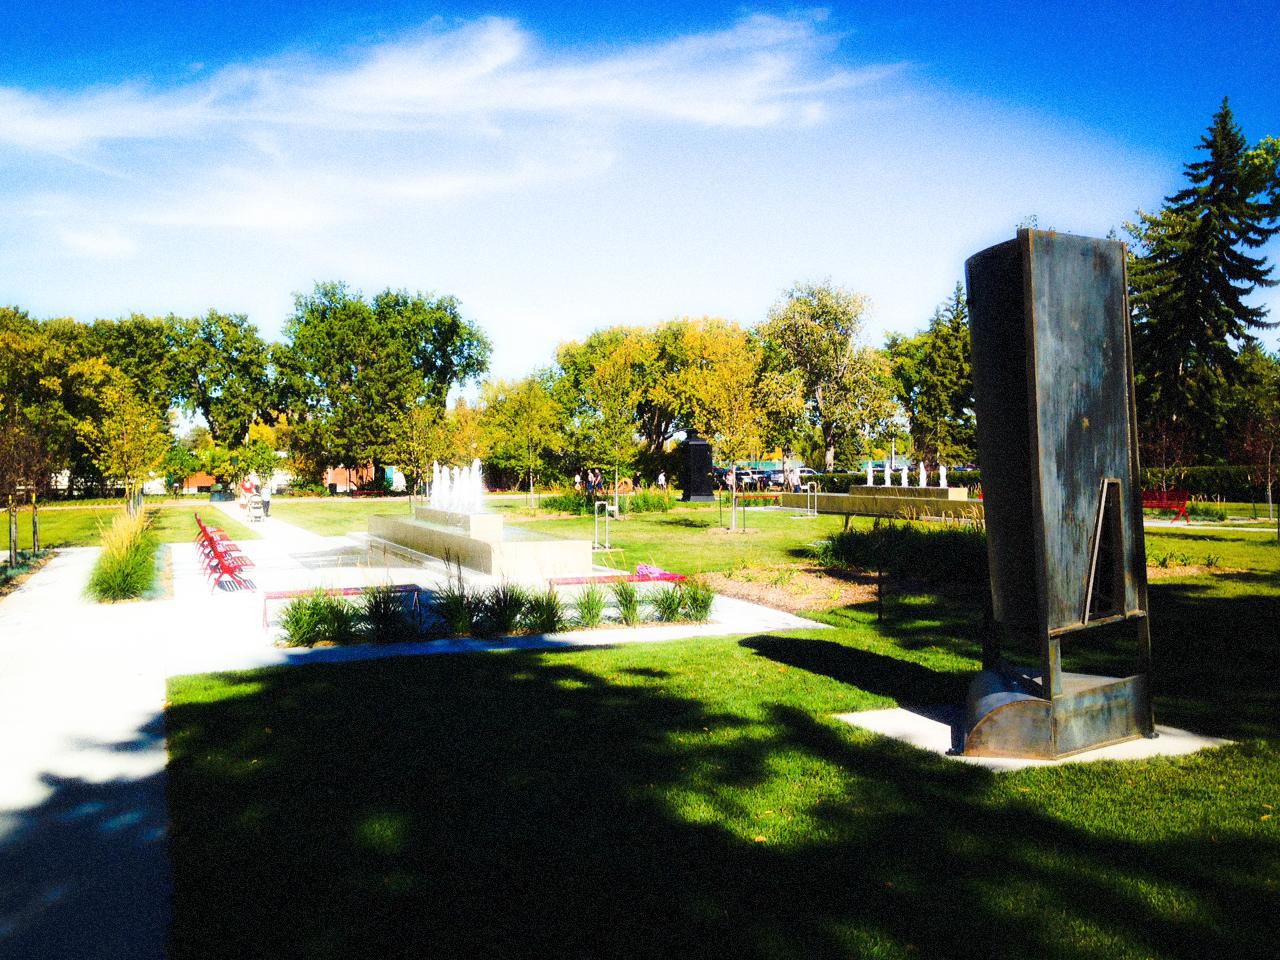 Big Things In The Formal Garden, Borden Park, Edmonton, Alberta, VHS 2014